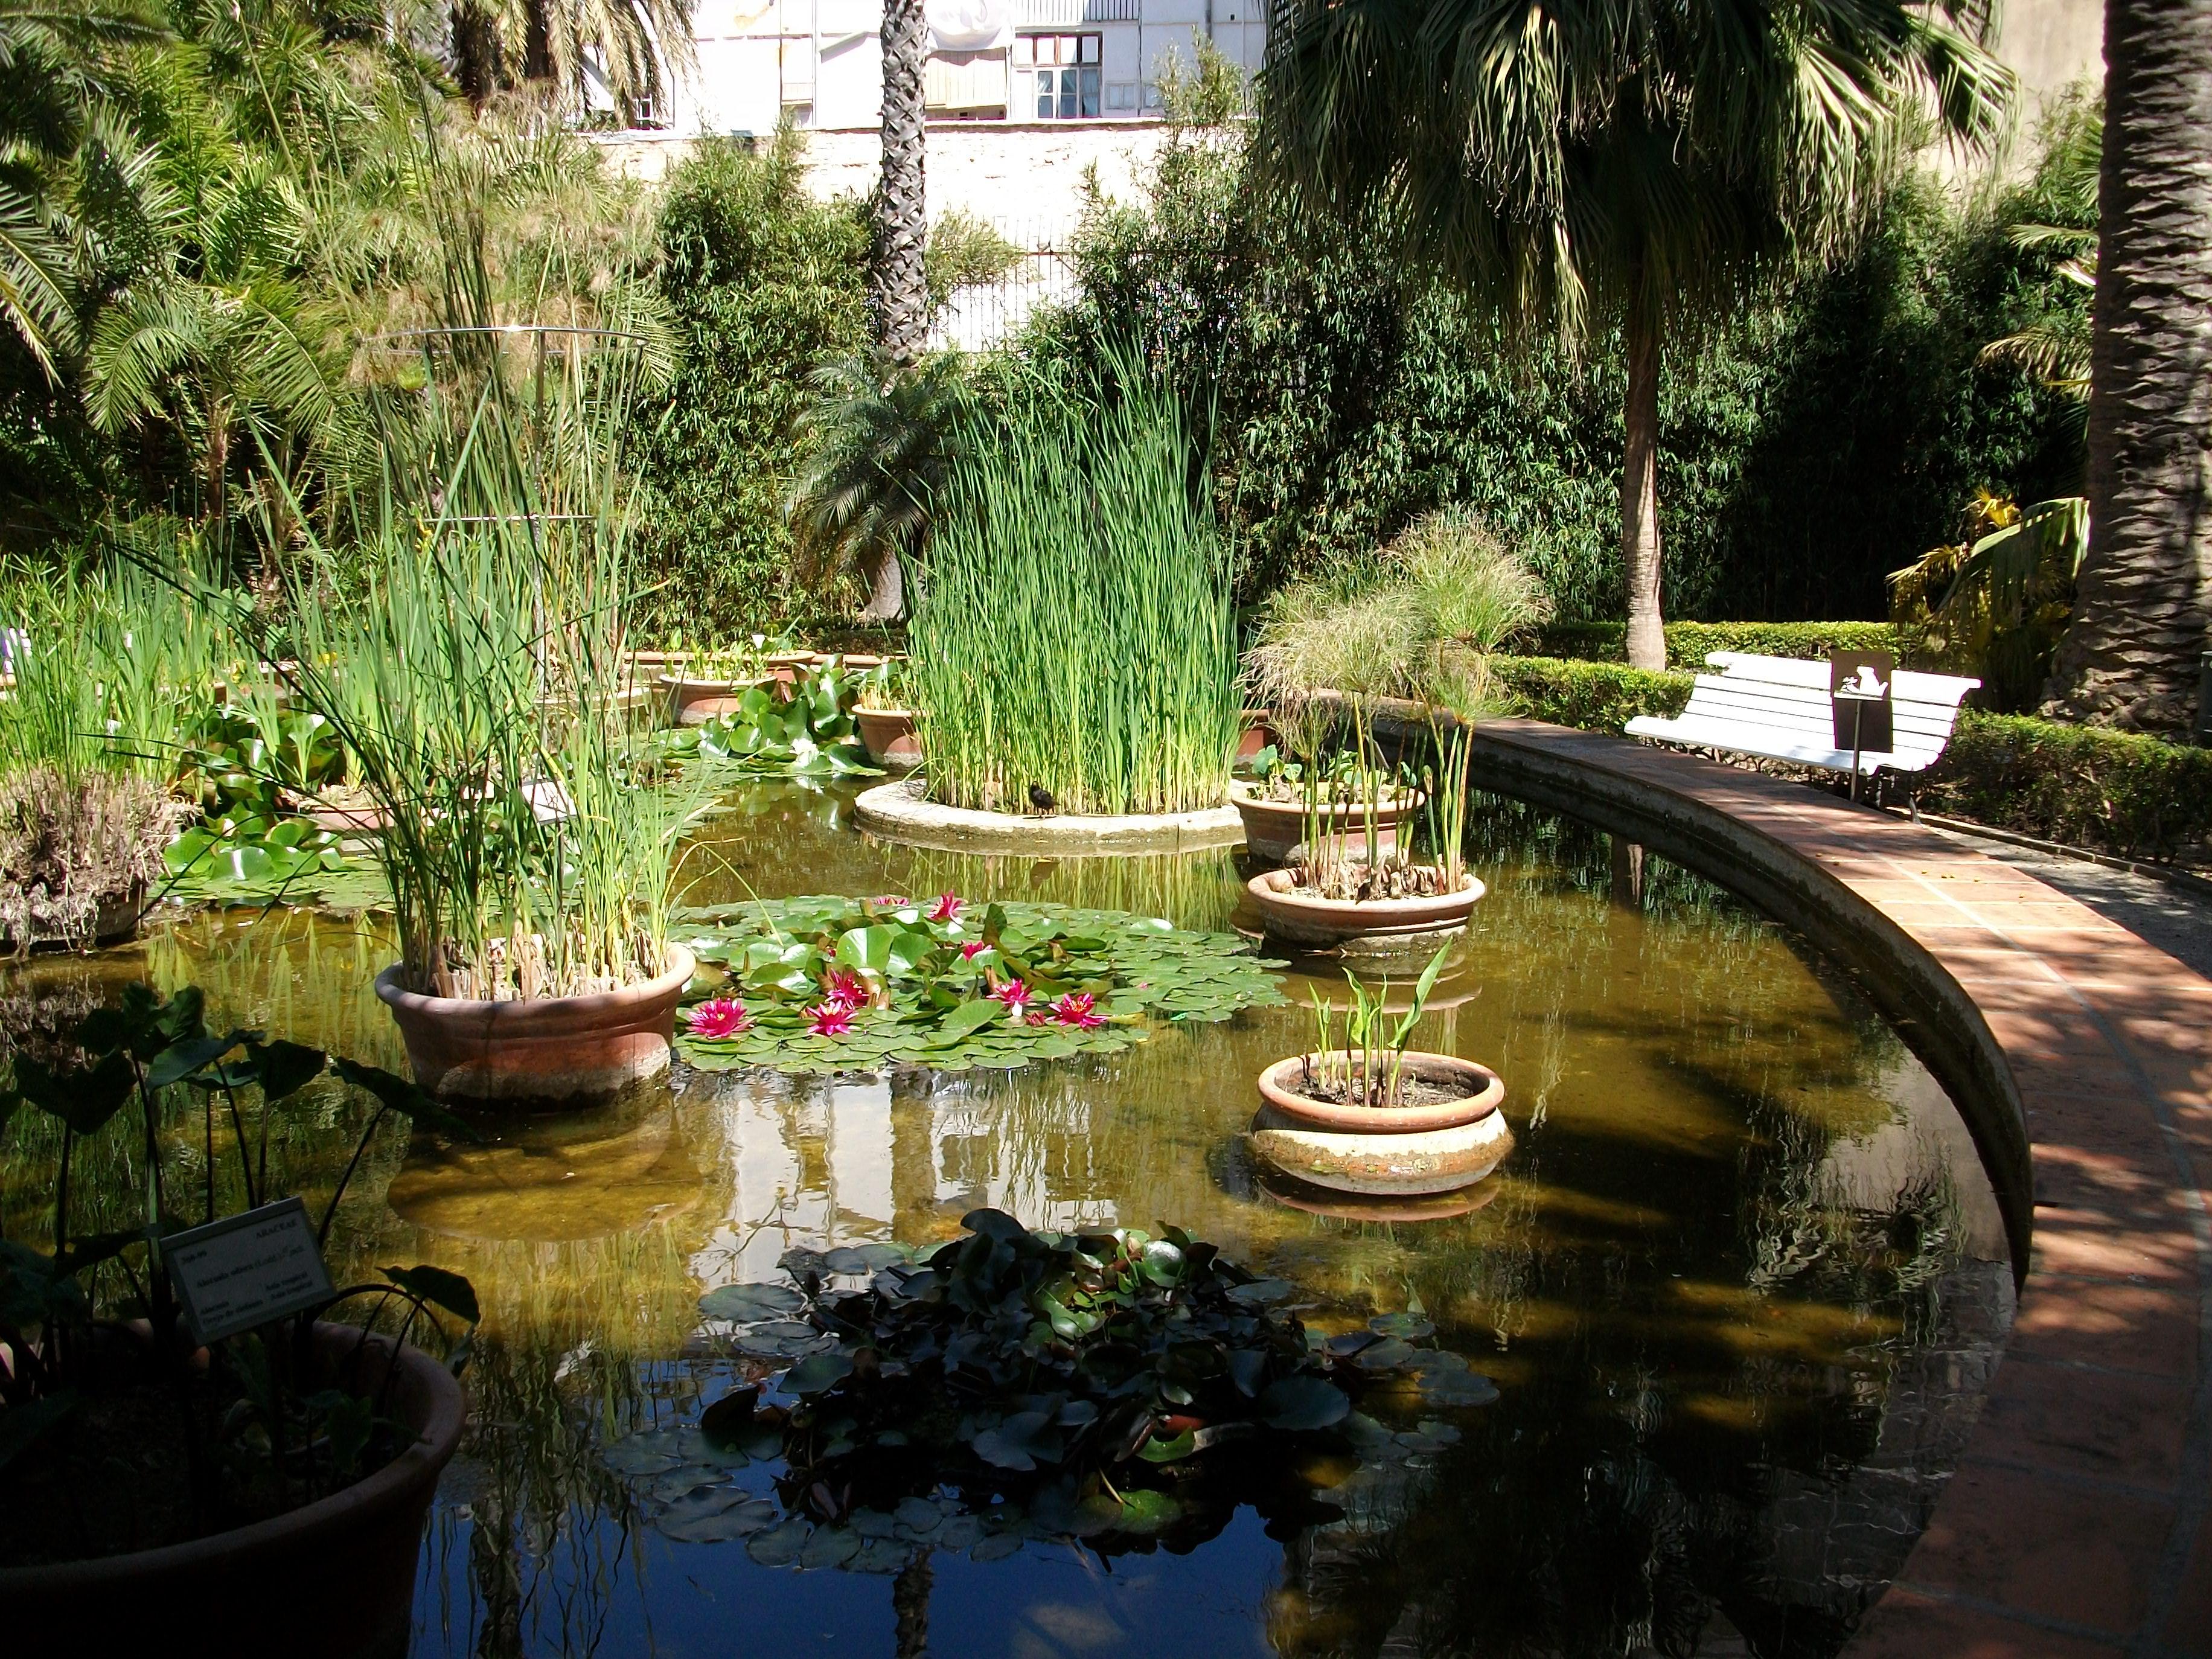 Fitxer bassa del jard bot nic de val ncia jpg - Jardin botanico valencia ...